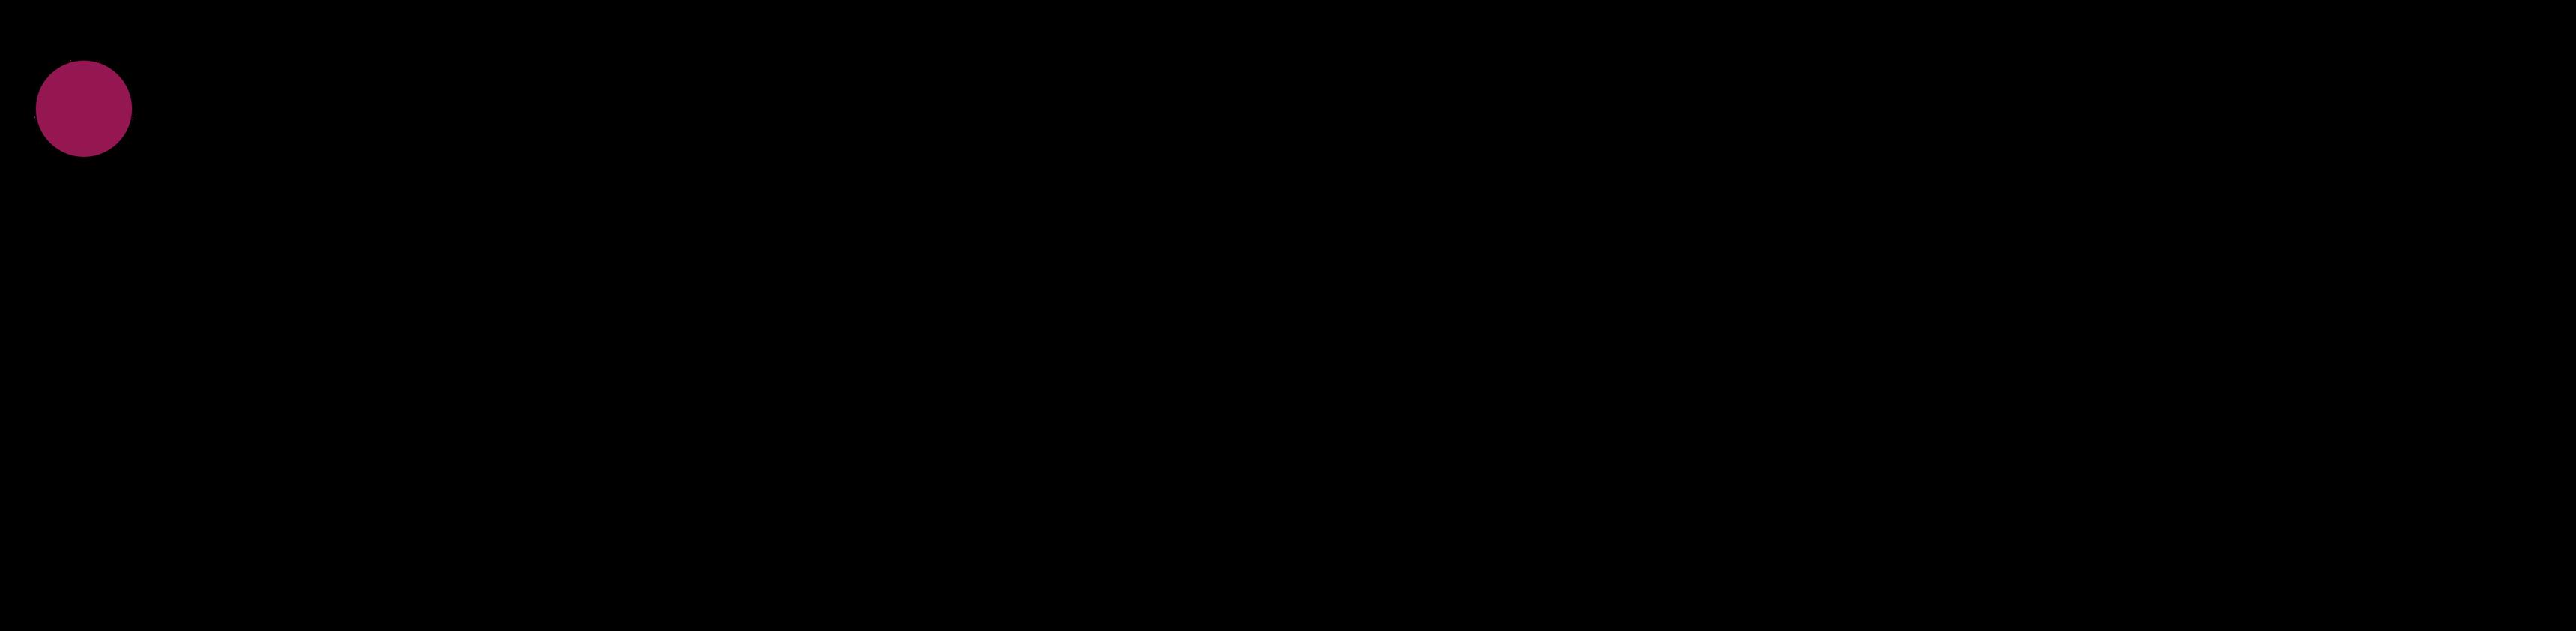 Irelaunch